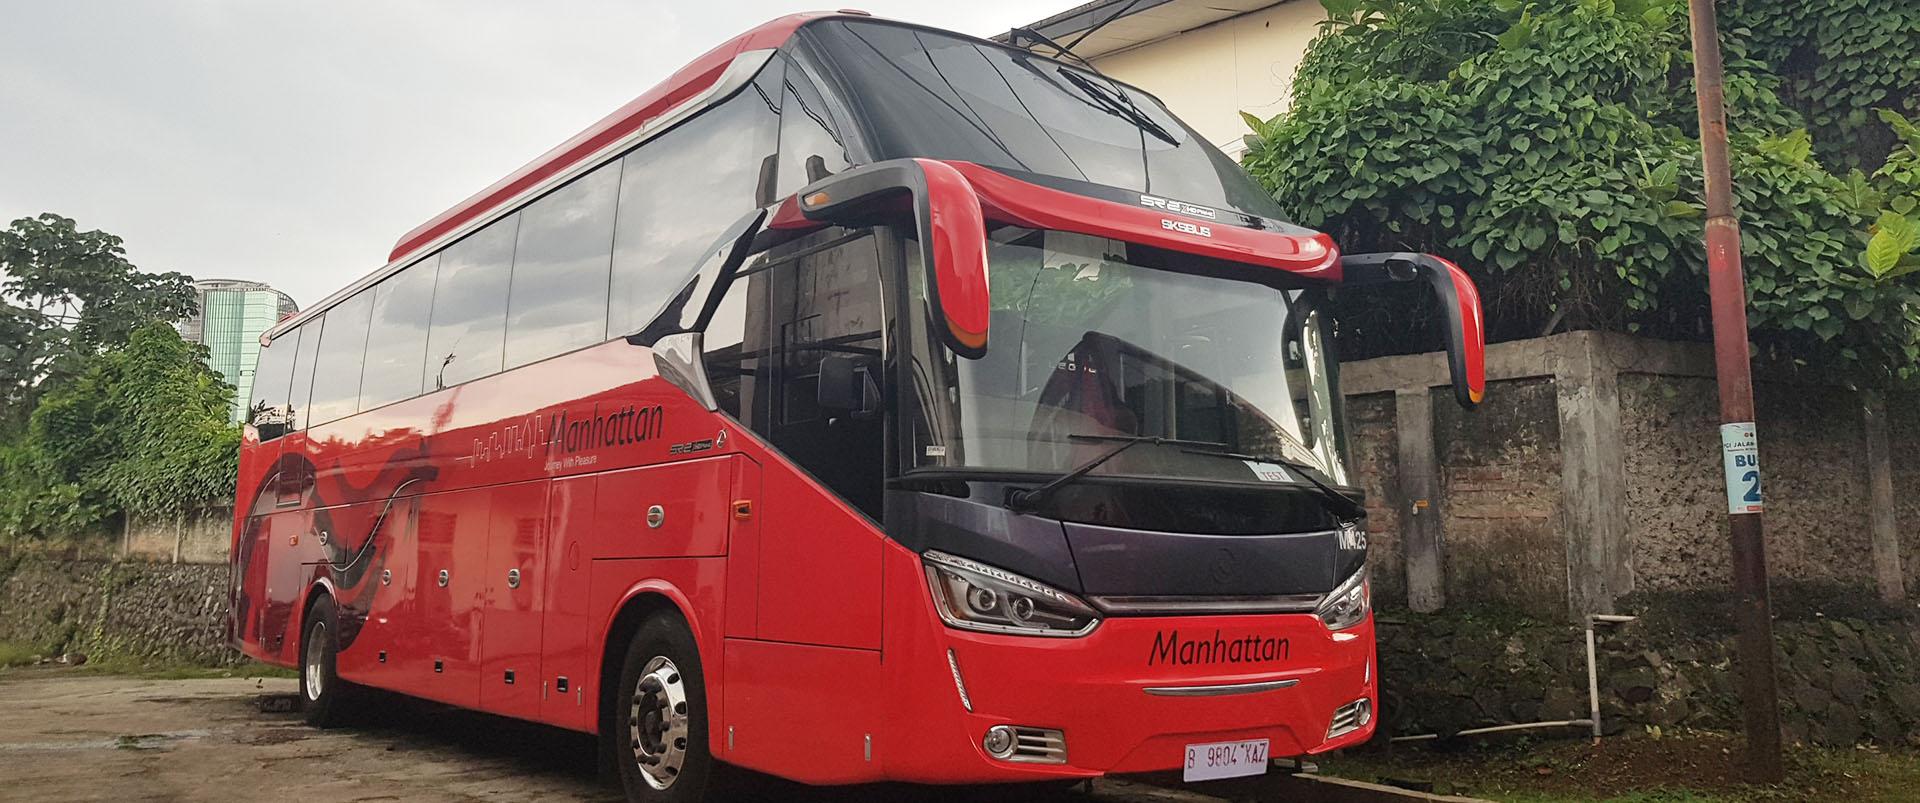 Sewa Bus Pariwisata Manhattan Jakarta Tahun 8 - Saturental